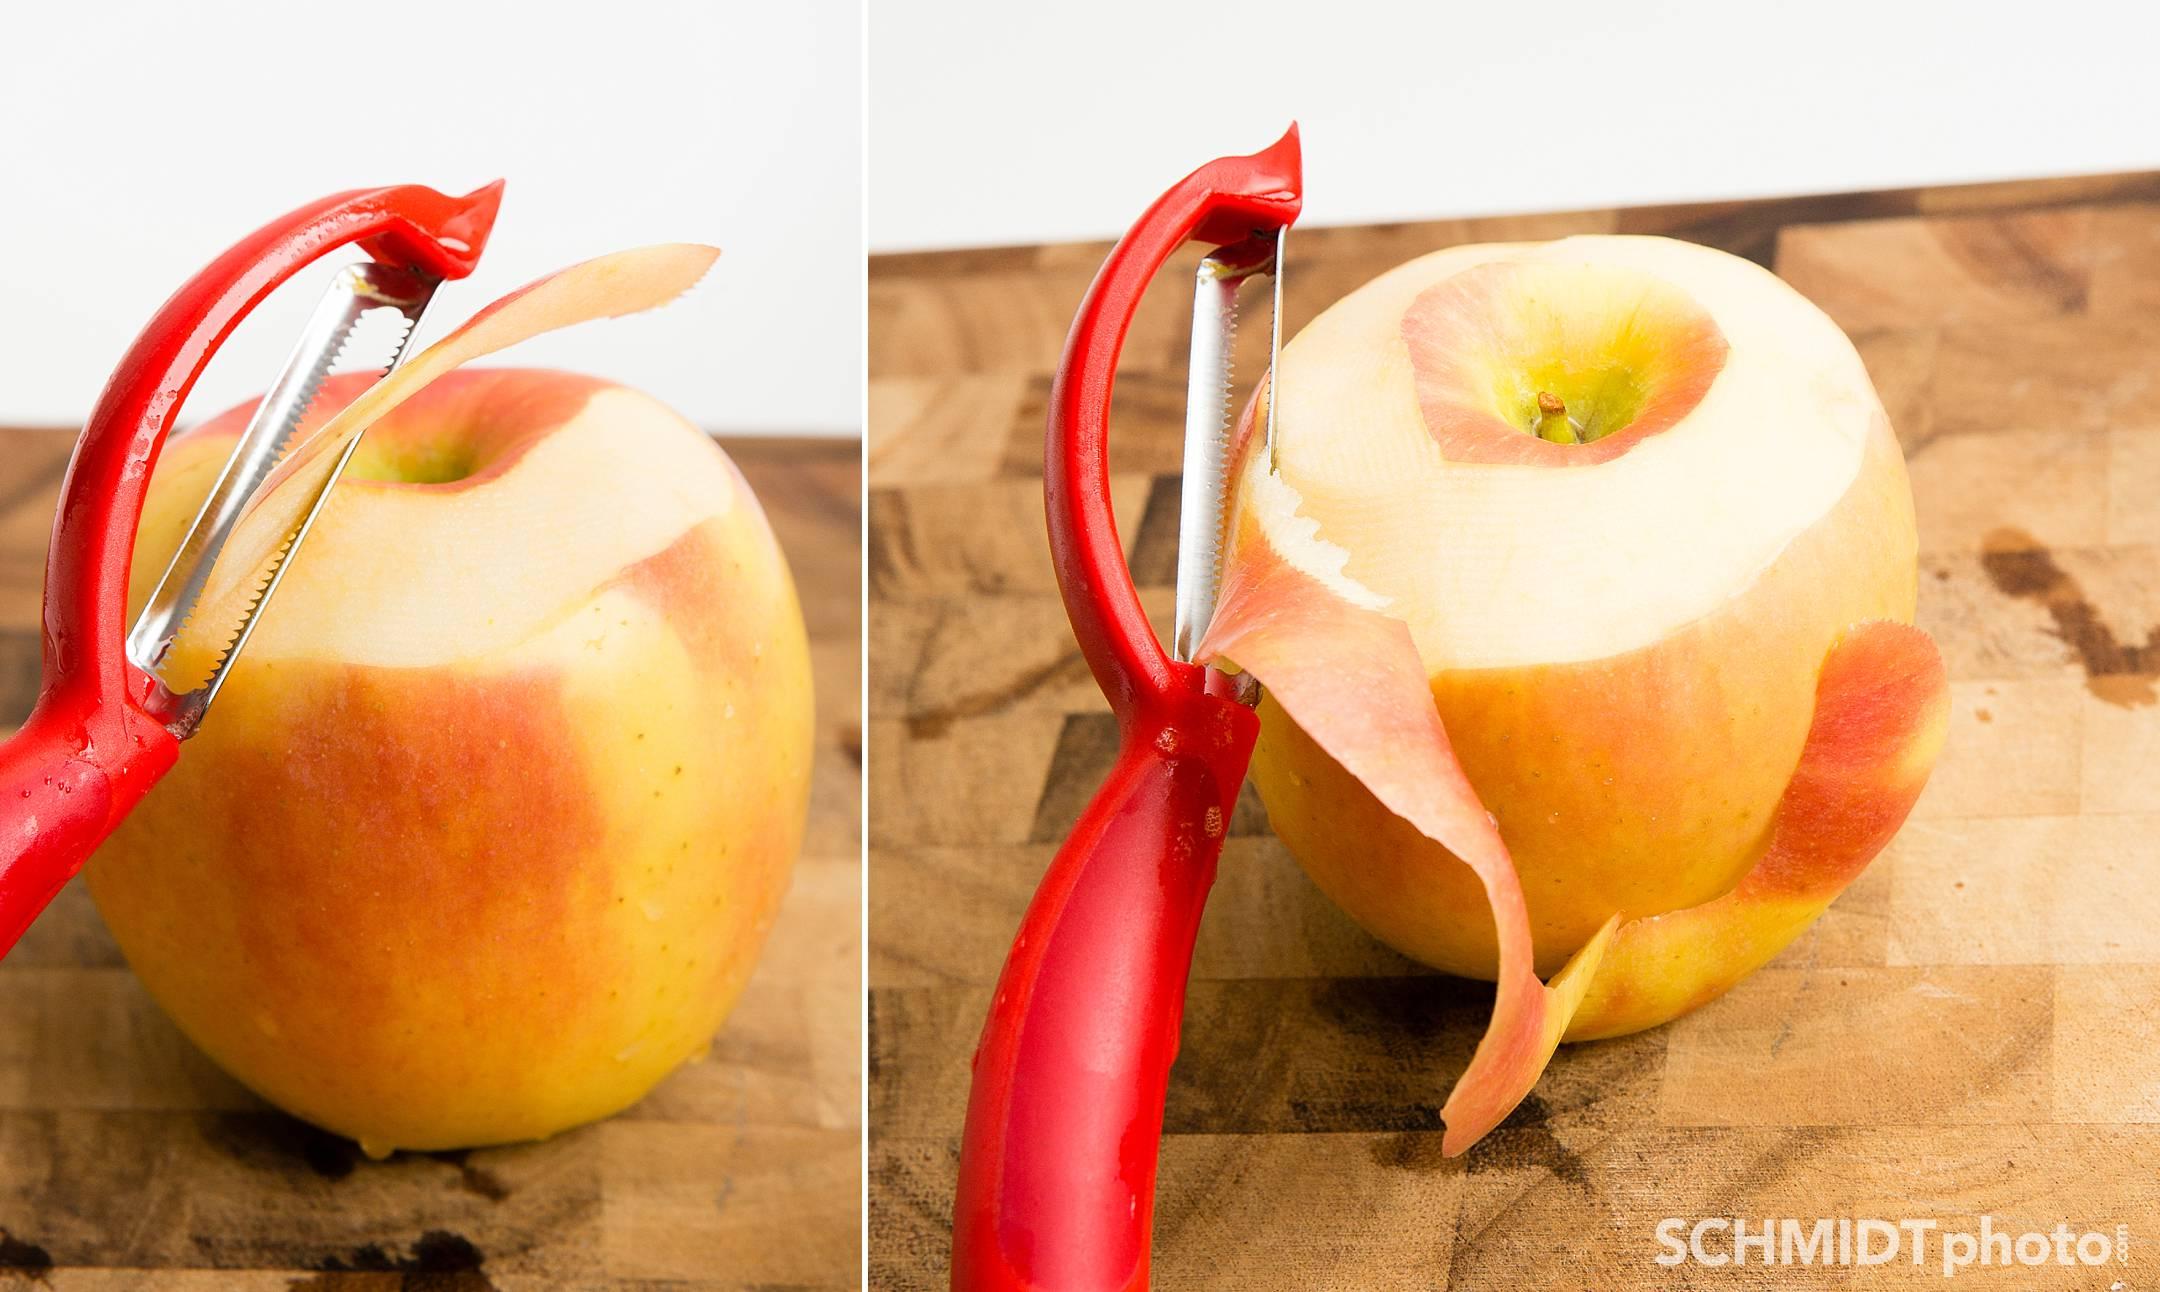 applesauce-homemade-easy-eat-with-tom-foodblog-schmidt-photo_2095